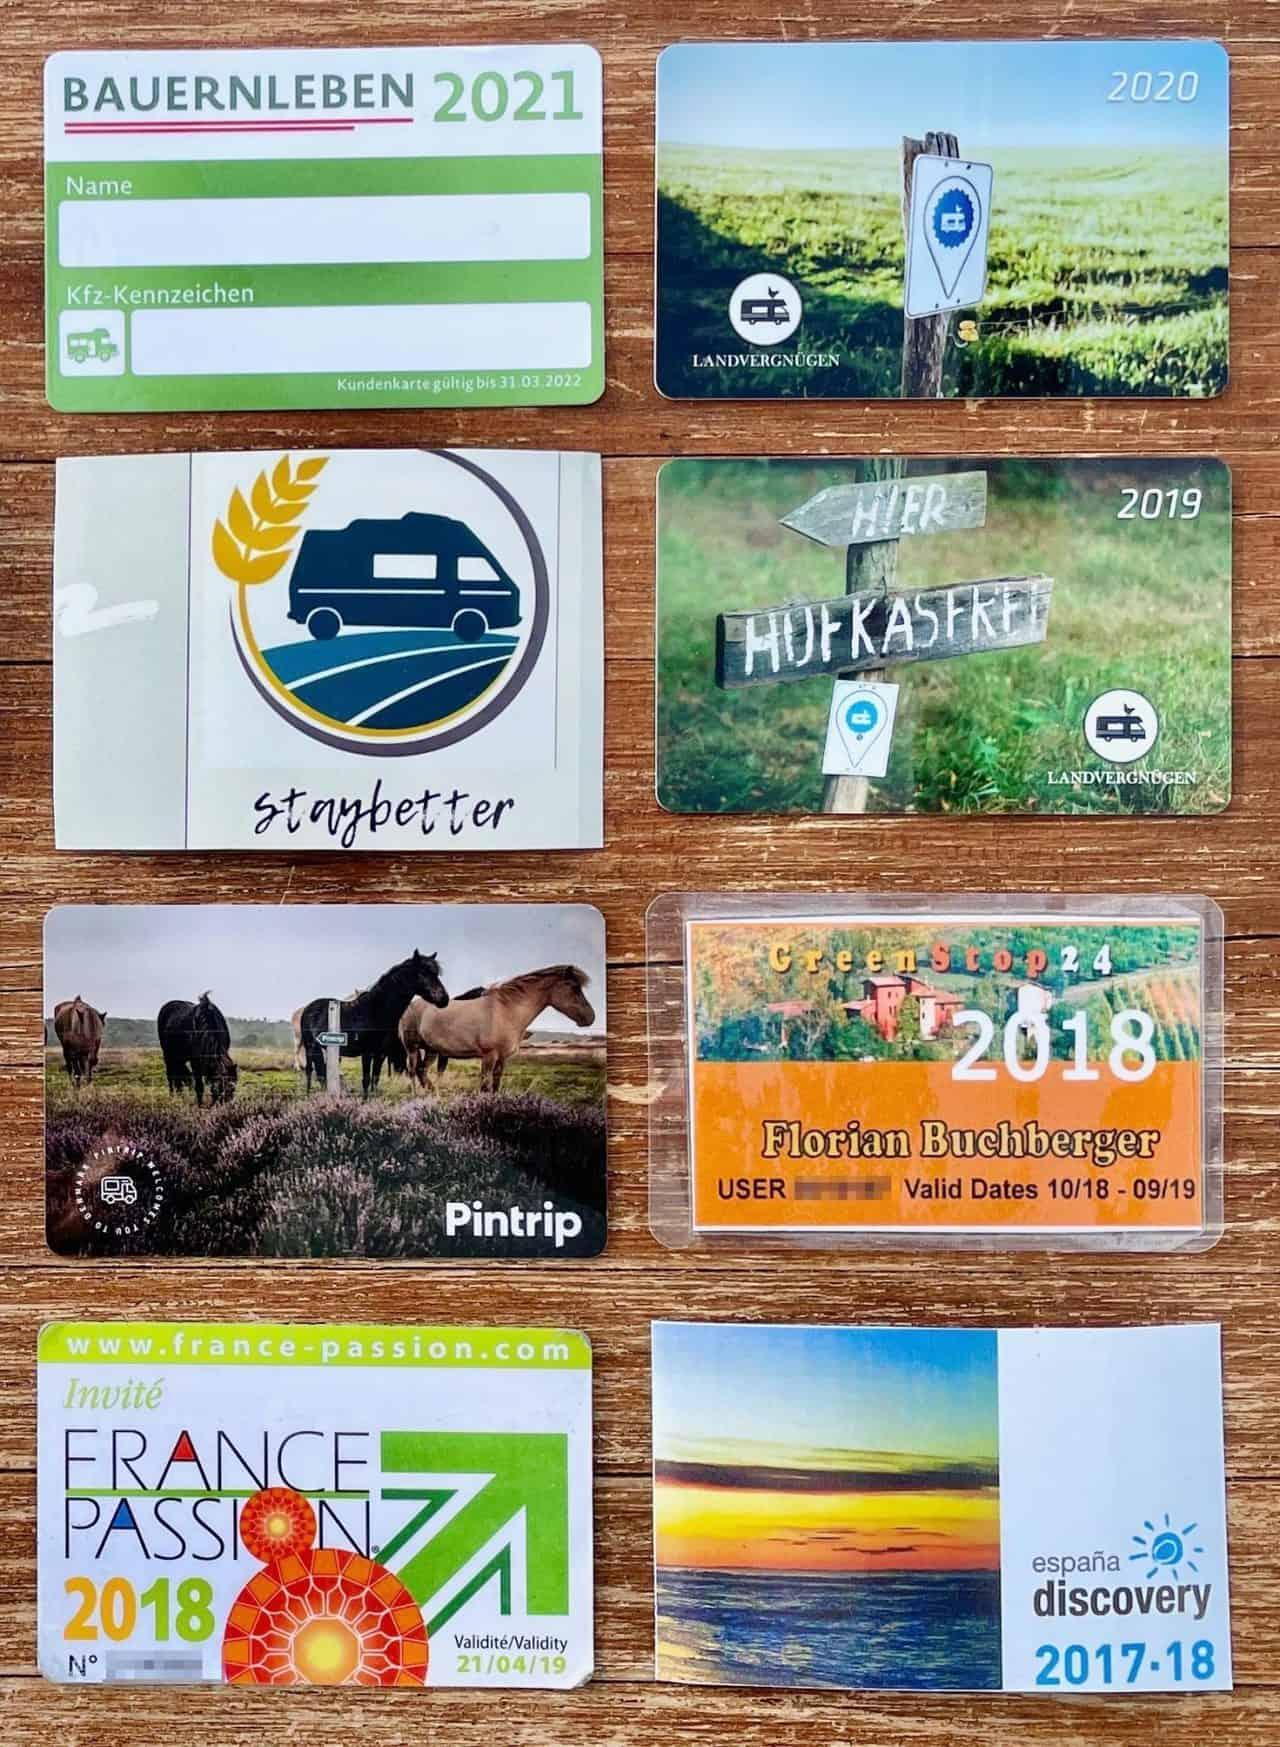 Campingkarten-FRANCE-PASSION-GREENSTOP24-LANDVERGNÜGEN-STAYBETTER-FARM-ESPANA-DISCOVERY-BAUERNLEBEN-PINTRIP-GREENSTOP24